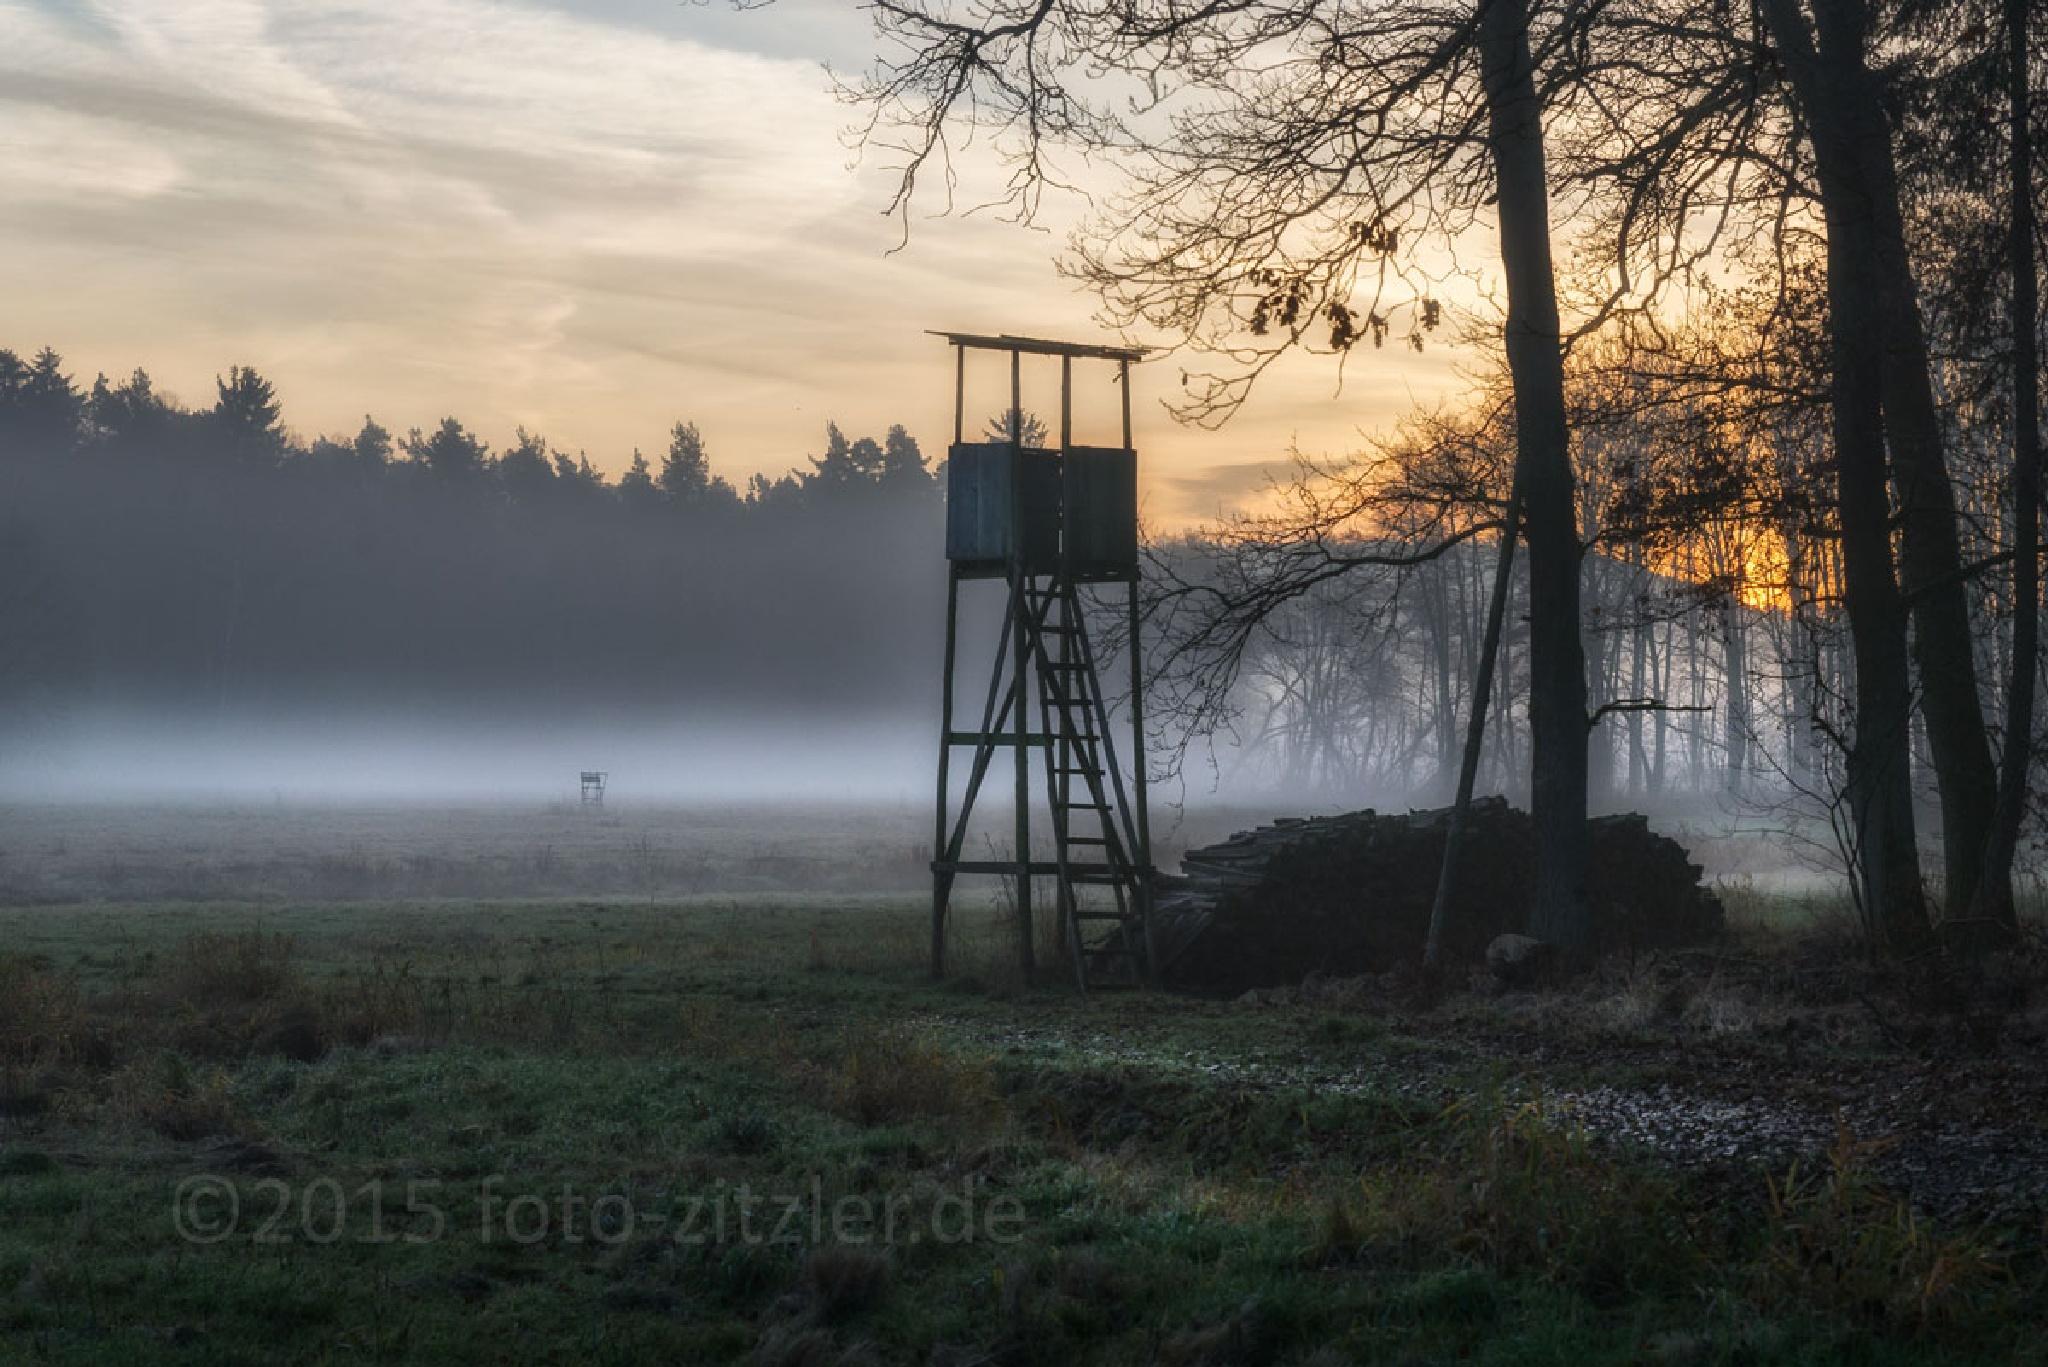 hunters land by Hans Zitzler